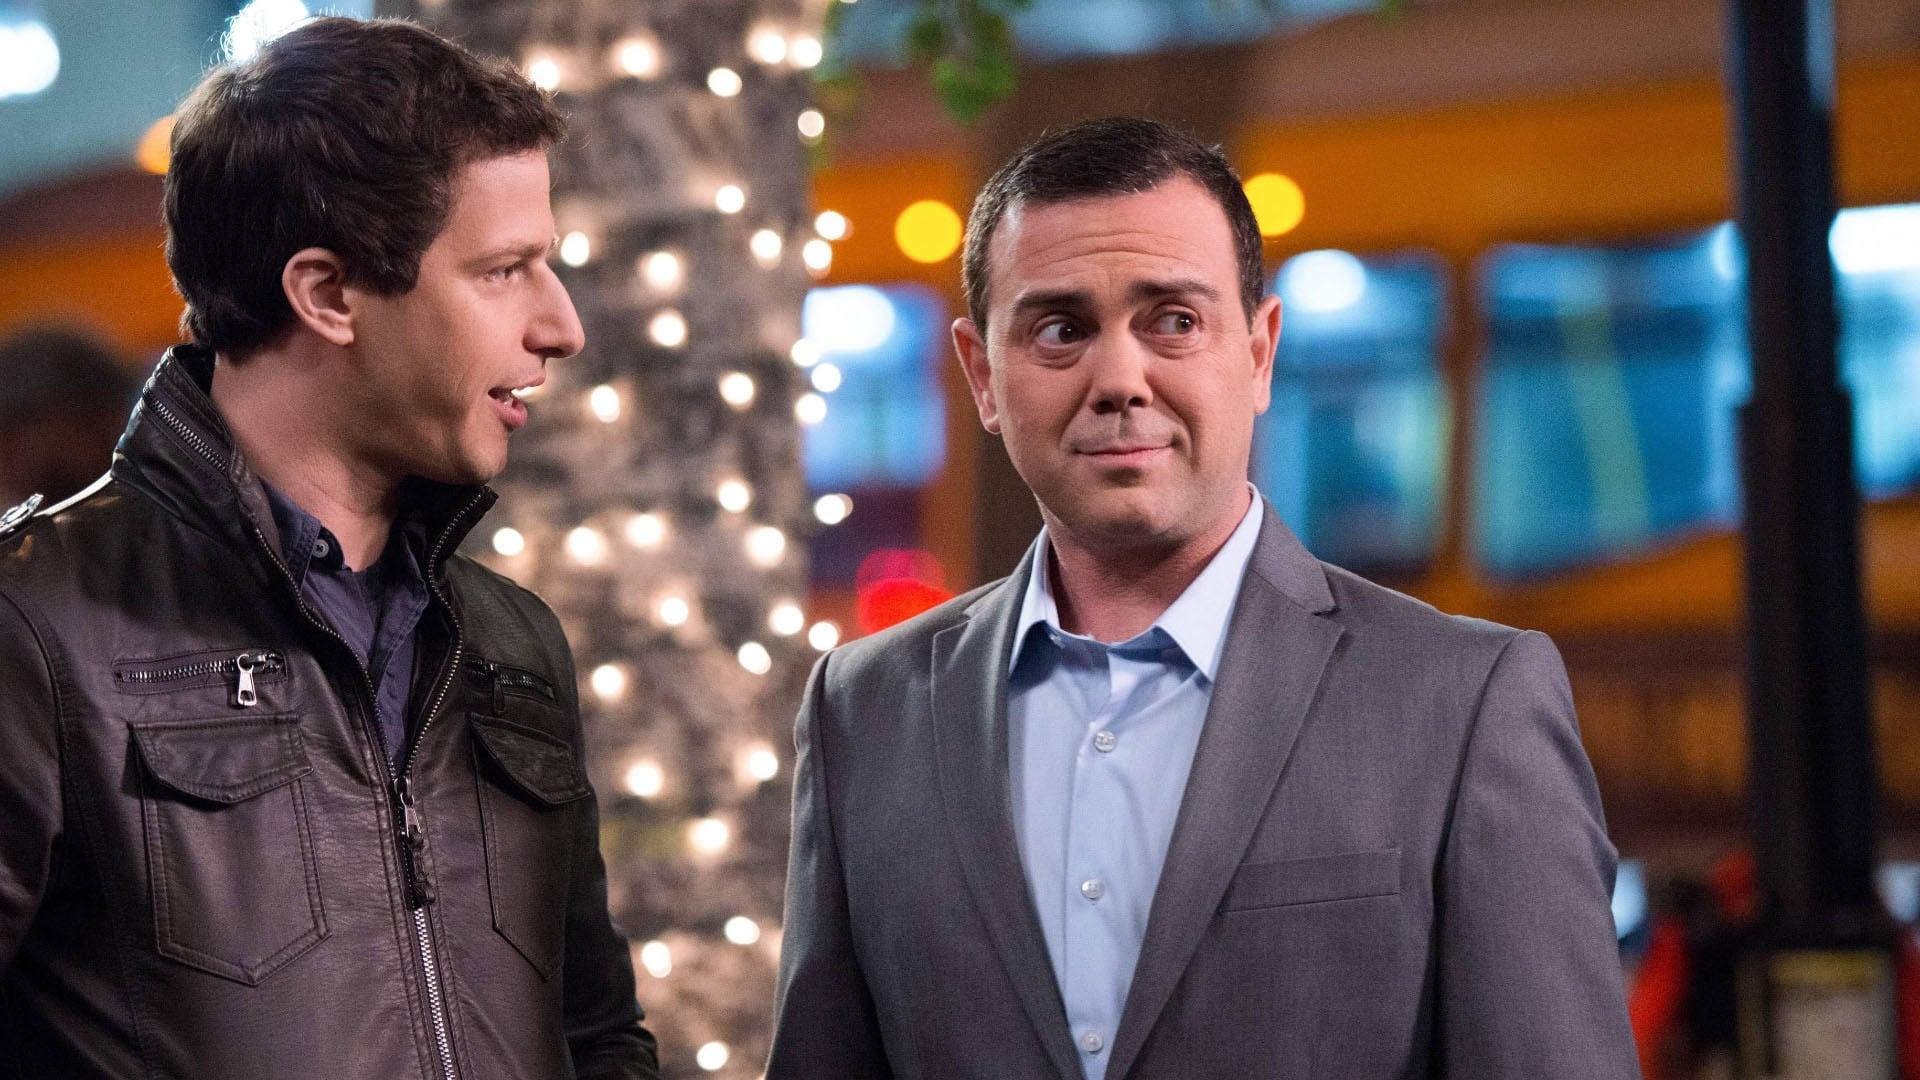 Brooklyn Nine-Nine - Season 1 Episode 17 : Full Boyle